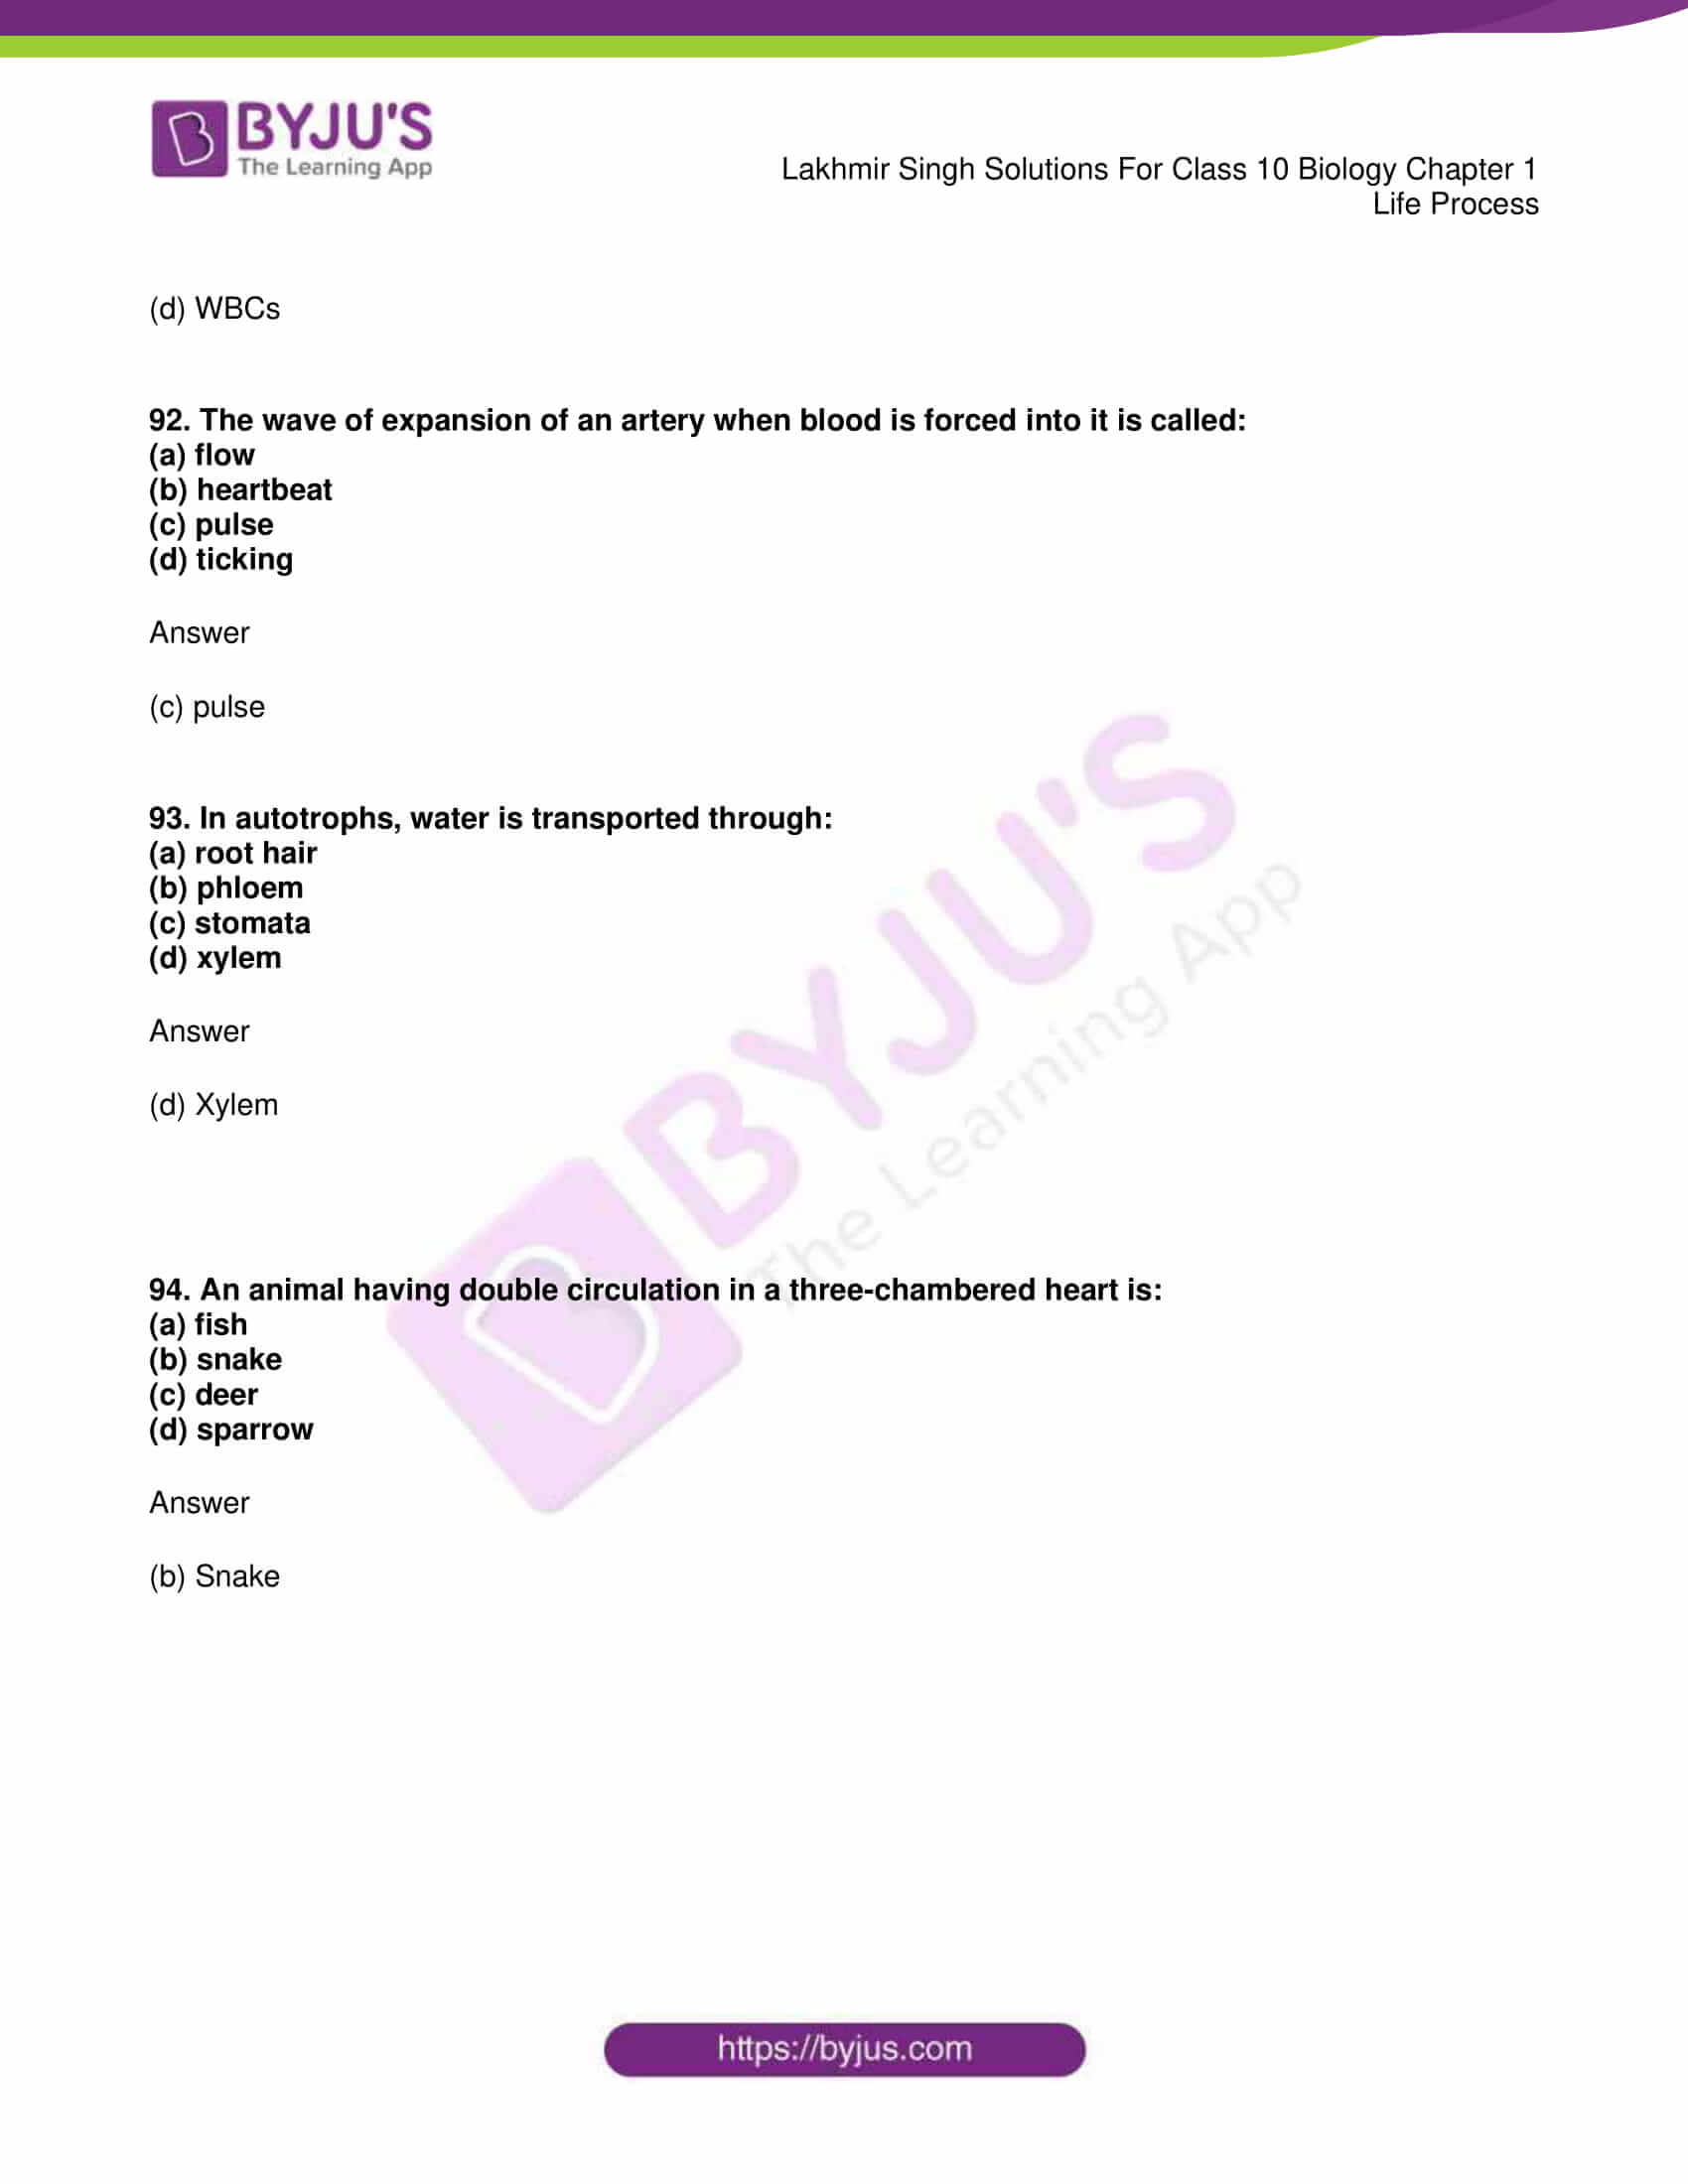 lakhmir singh sol class 10 biology chapter 1 89